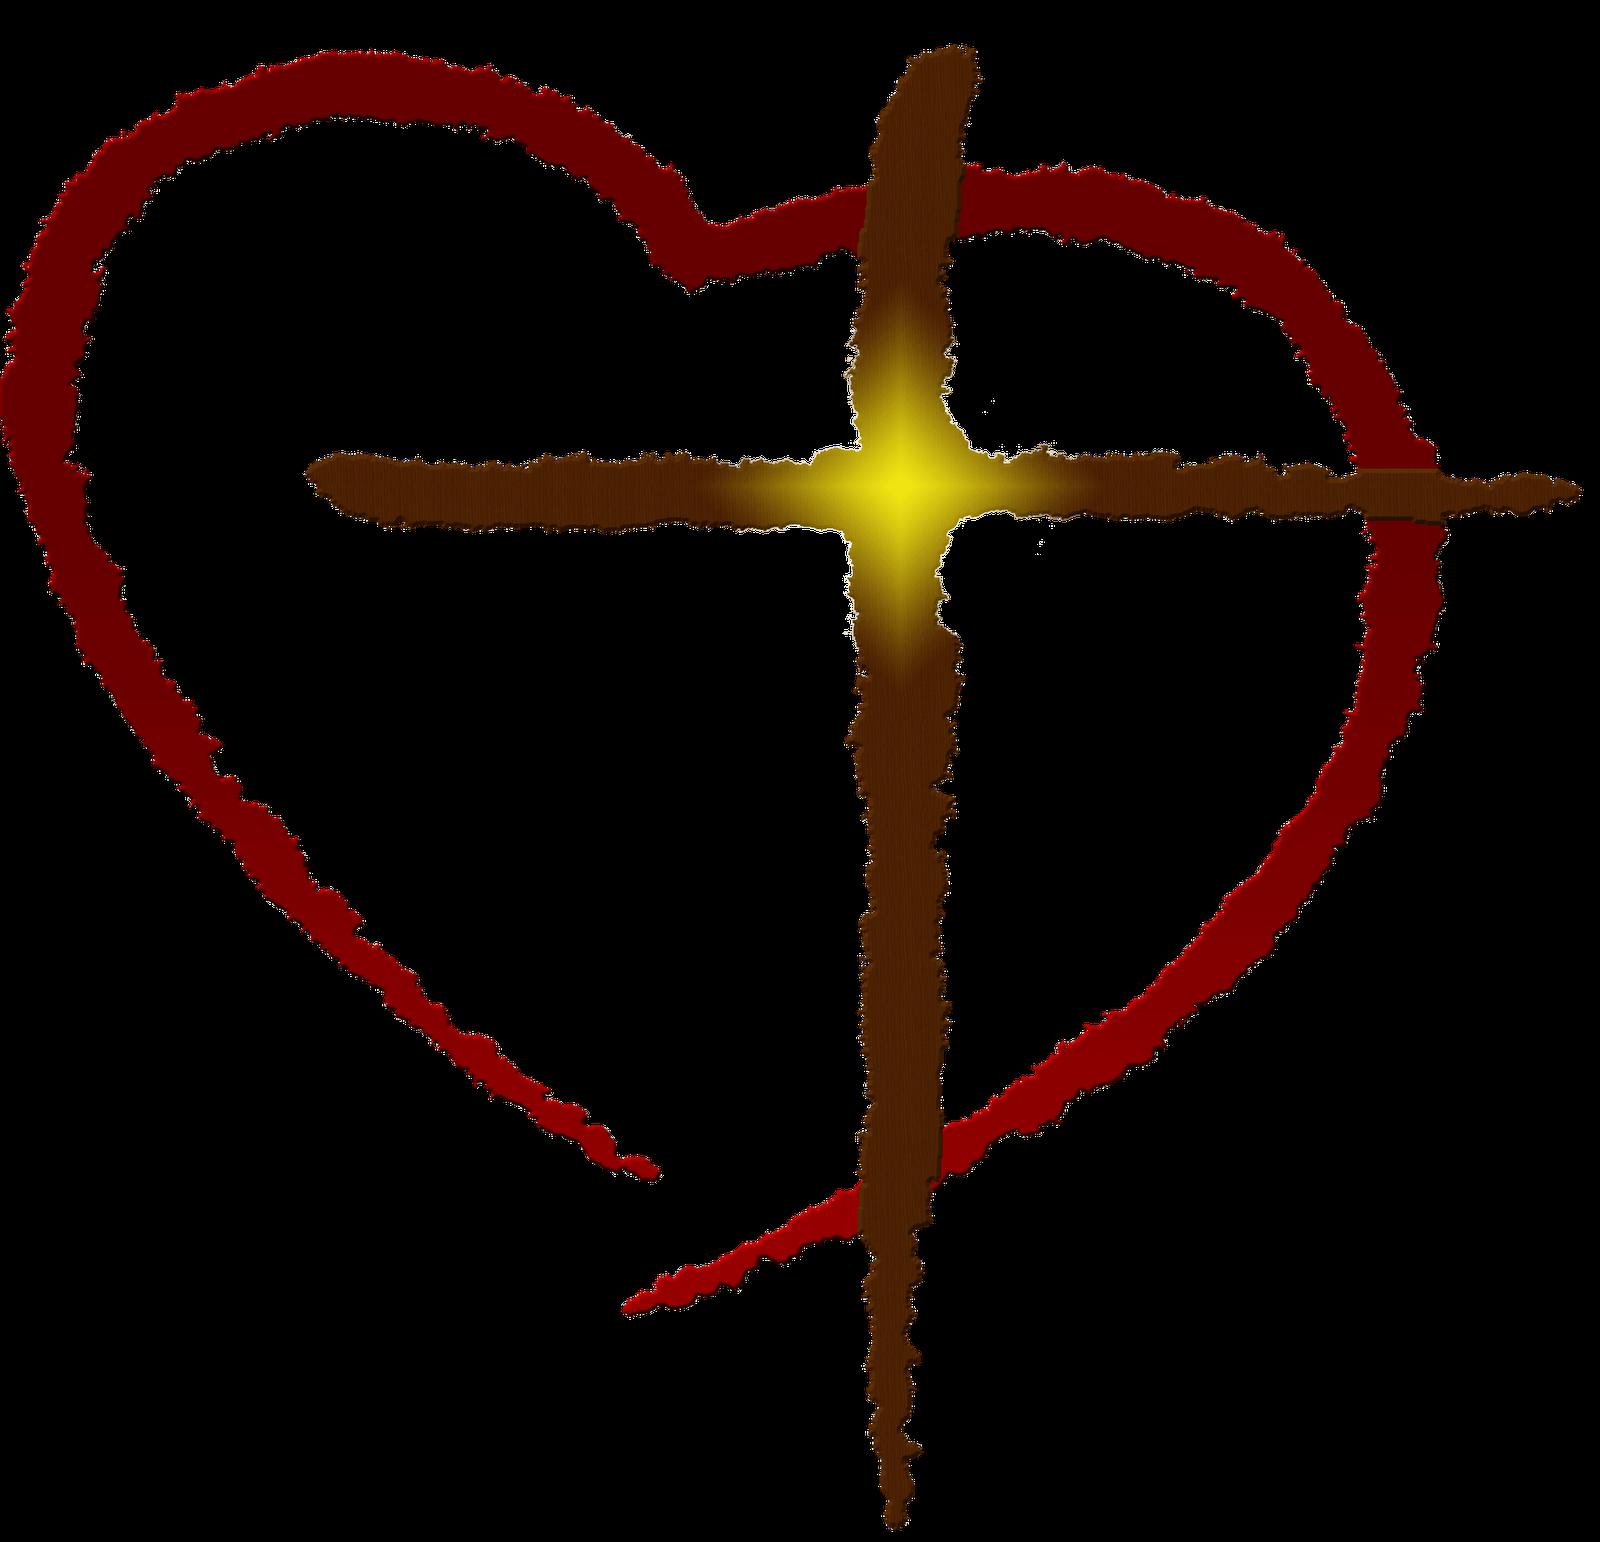 Free Christian Love Cliparts, Download Free Clip Art, Free Clip Art.